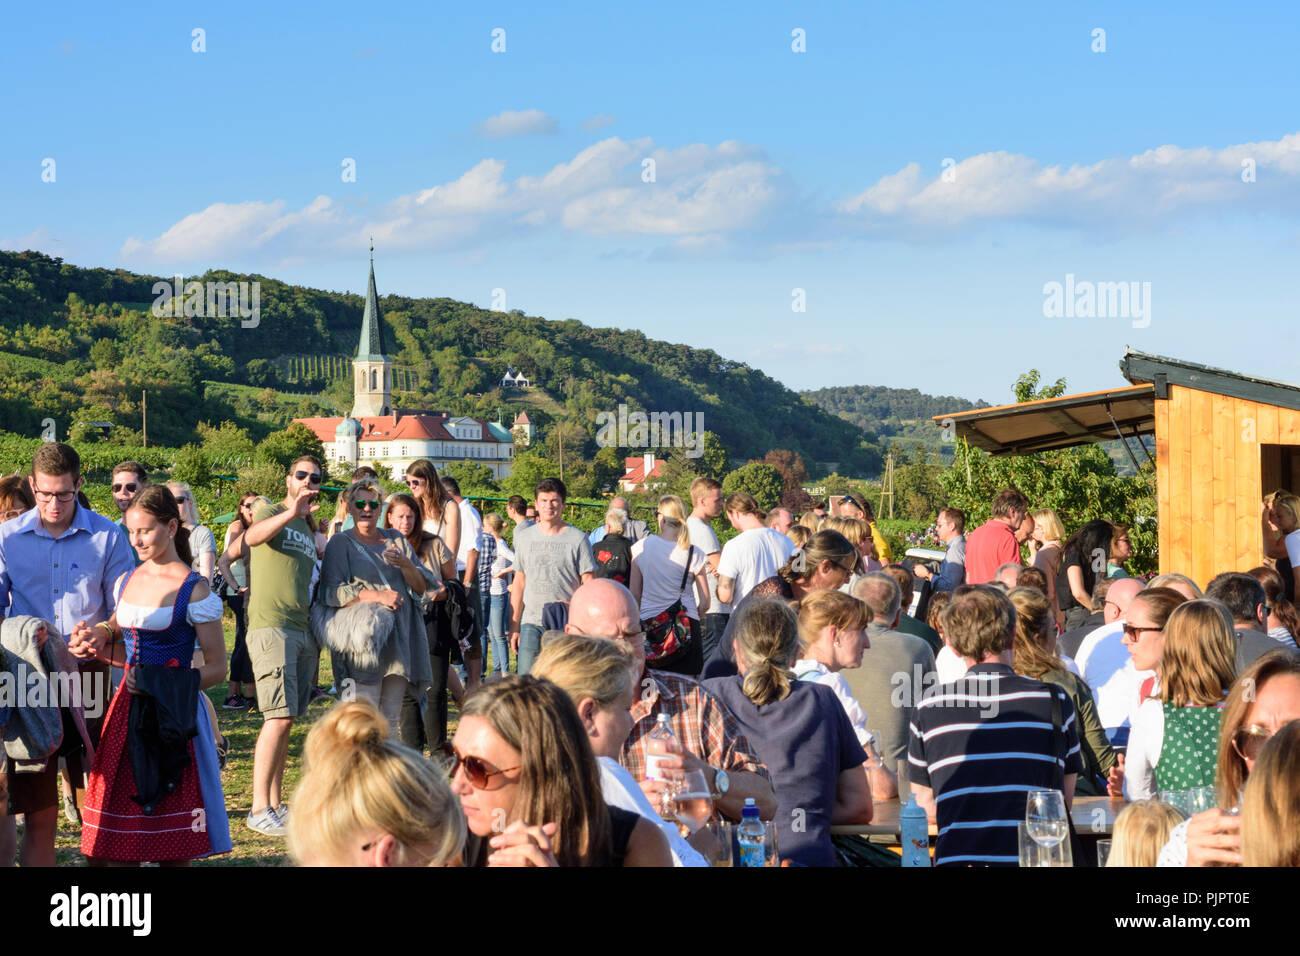 "Gumpoldskirchen: Deutschordensschloss (German Order Castle),  vineyard, bar at festival ""Genussmeile"" along 1st Vienna water line hiking path, winegro Stock Photo"